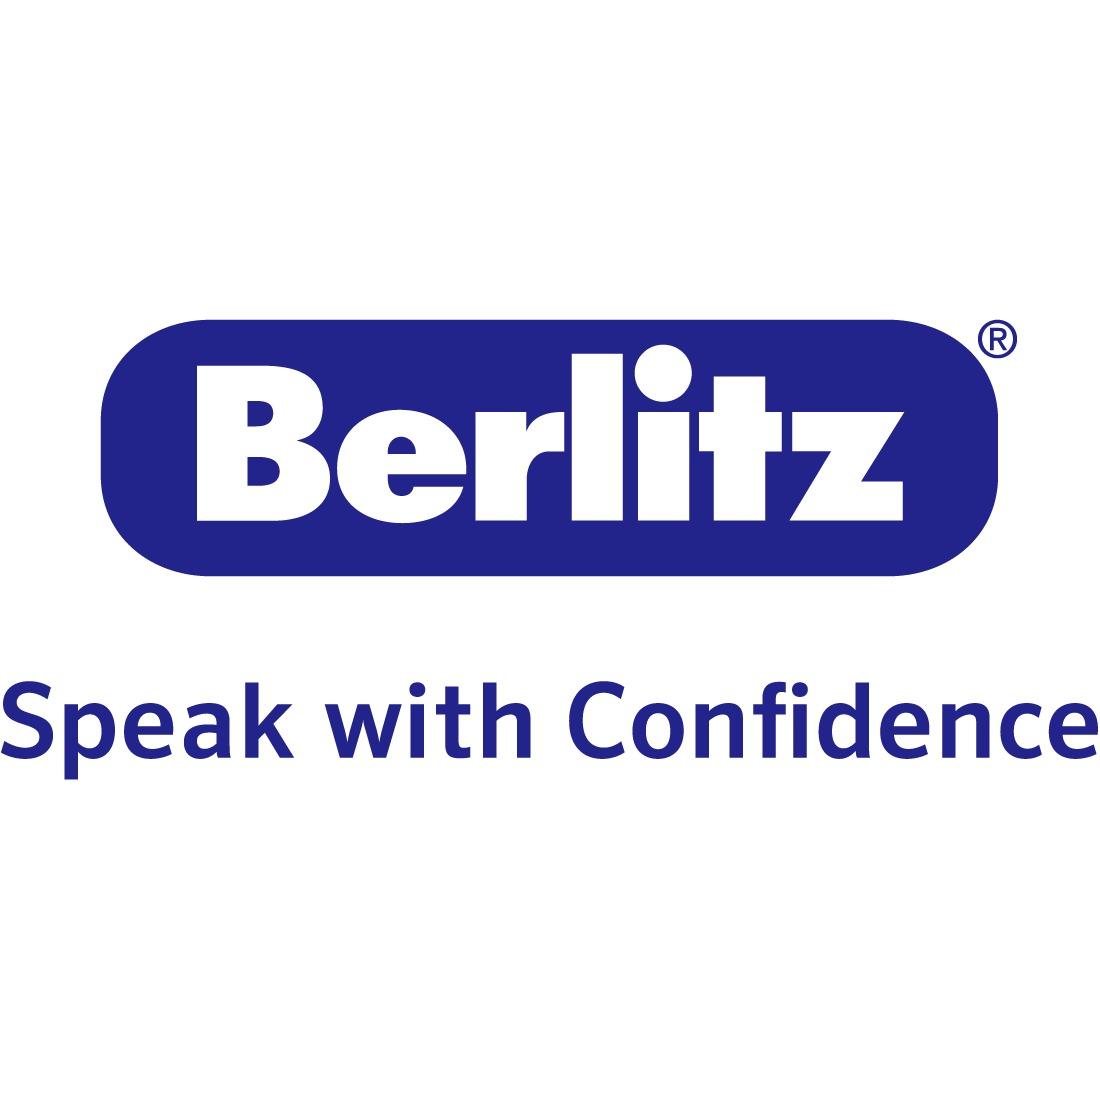 the BERLITZ logo.